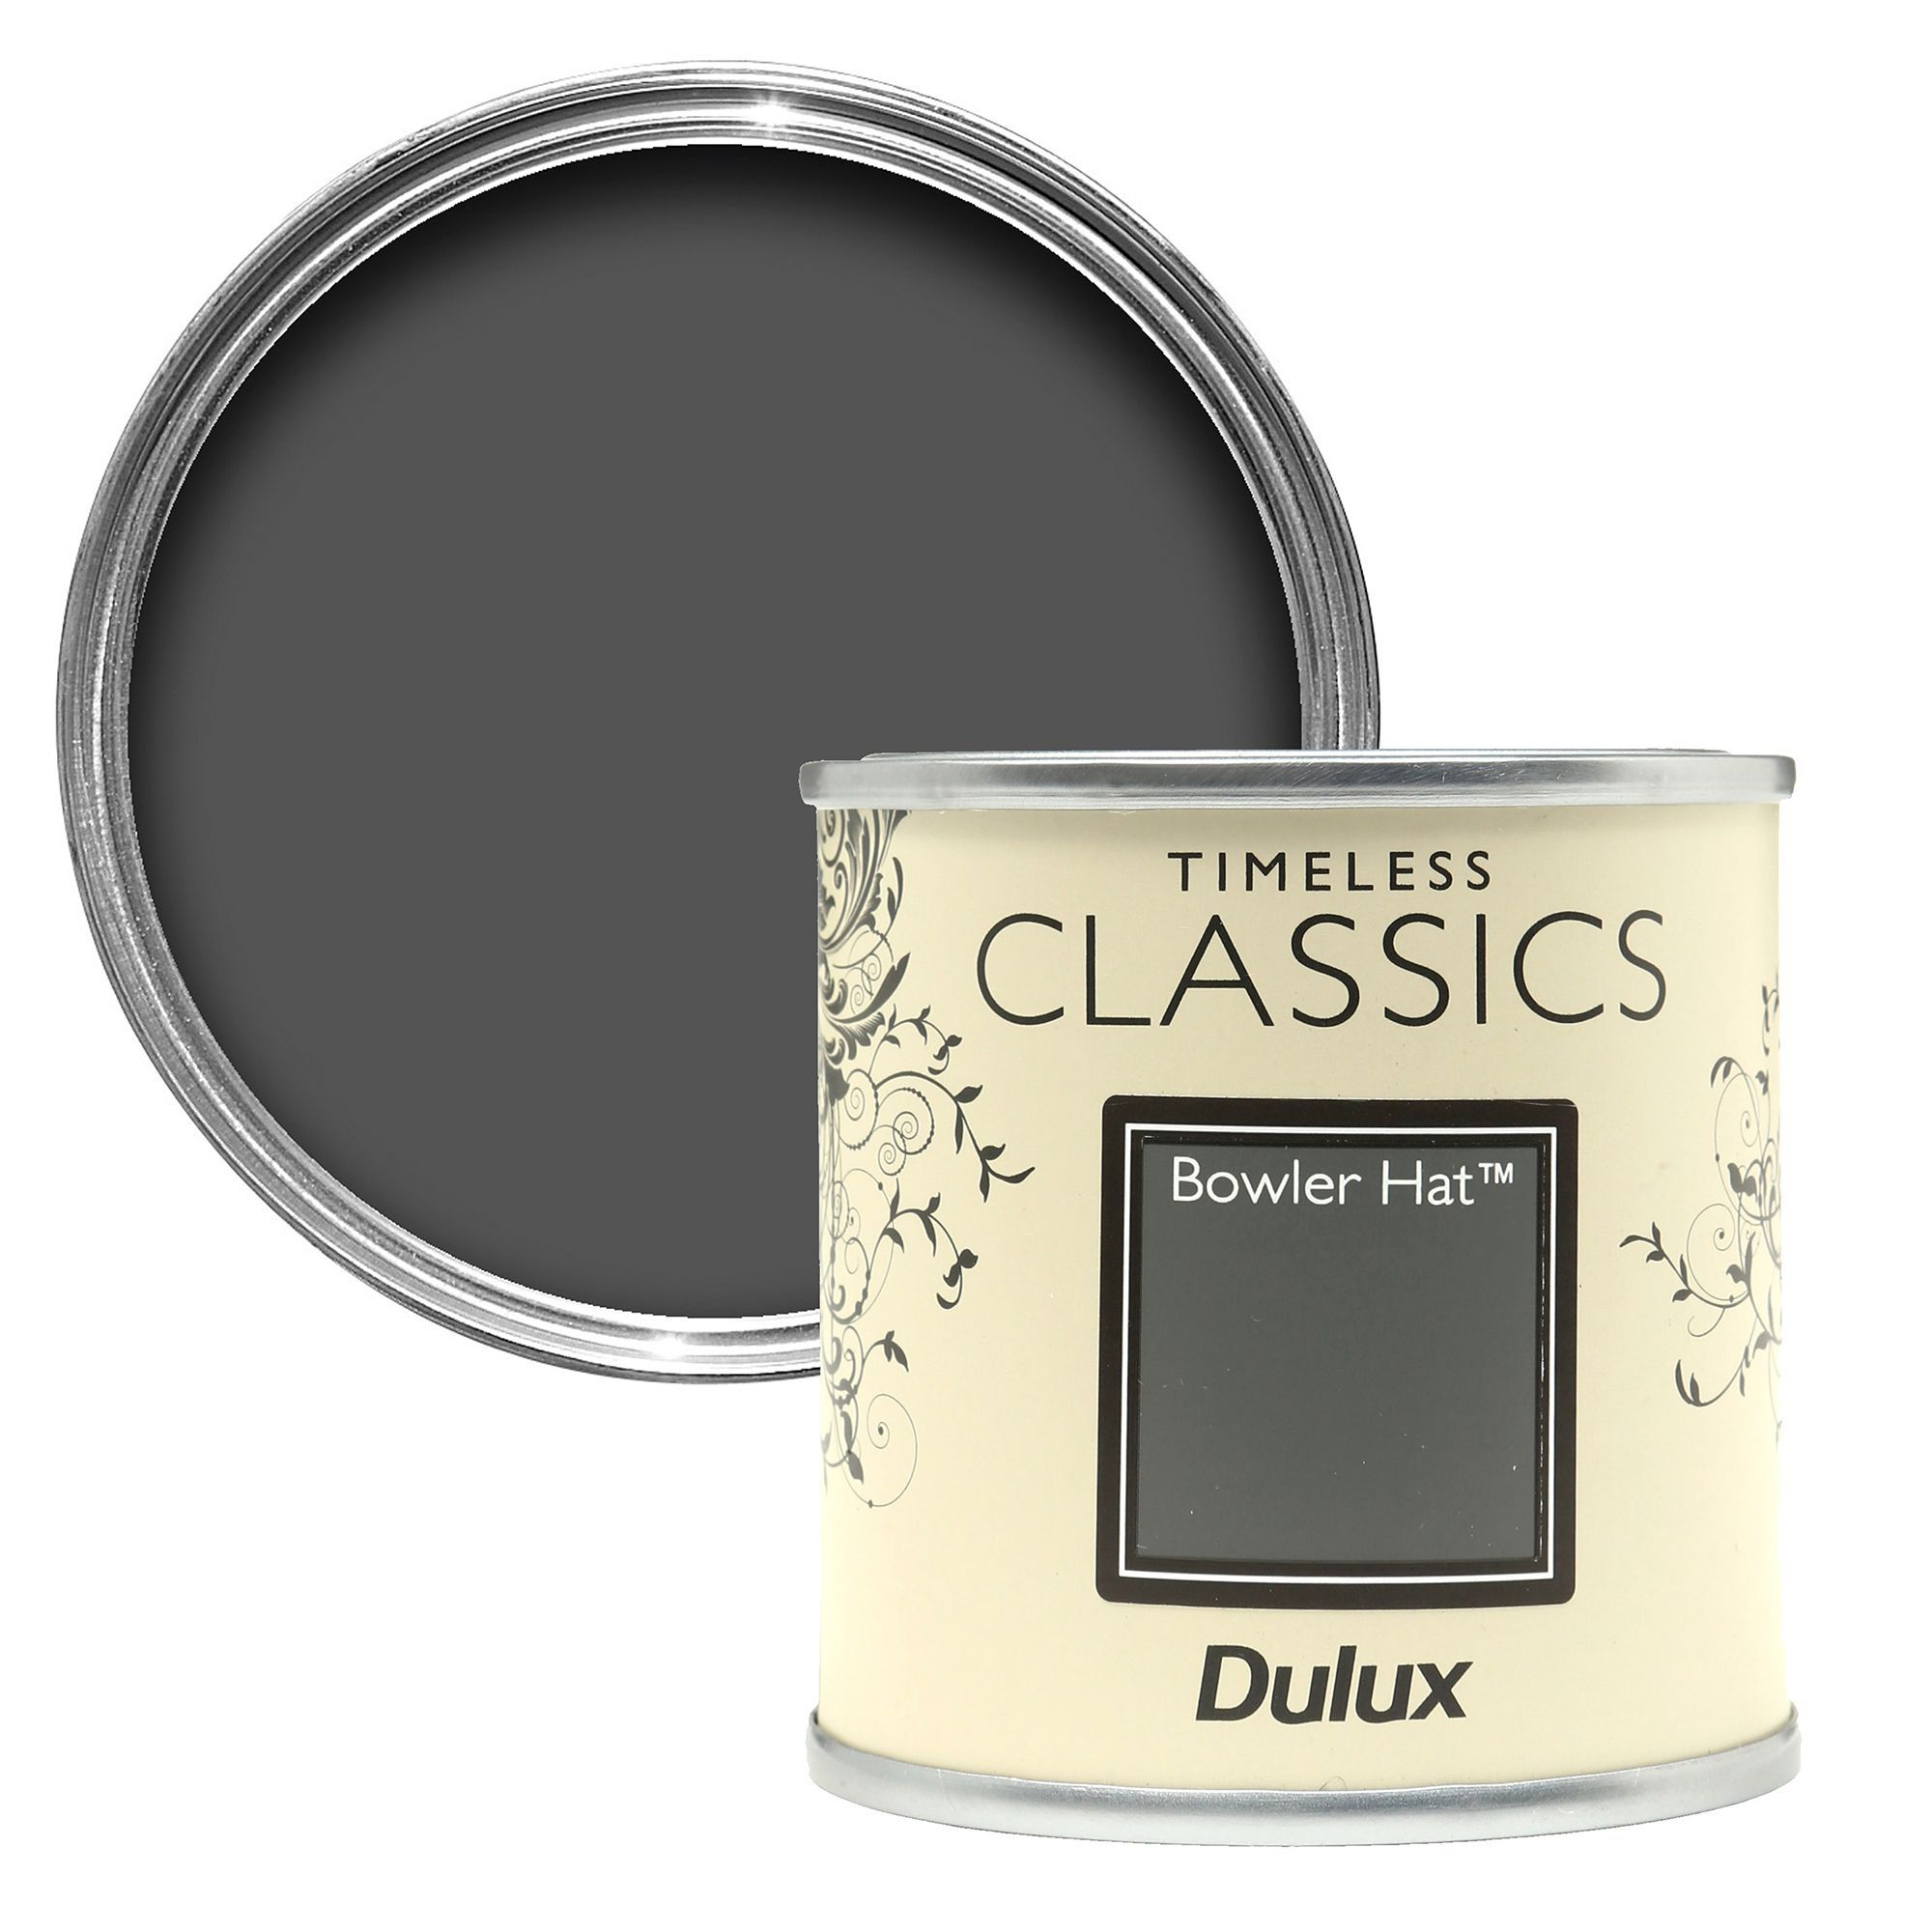 fb9f0b22c20a0 Dulux Timeless Classics Bowler Hat Matt Emulsion Paint 125ml Tester Pot